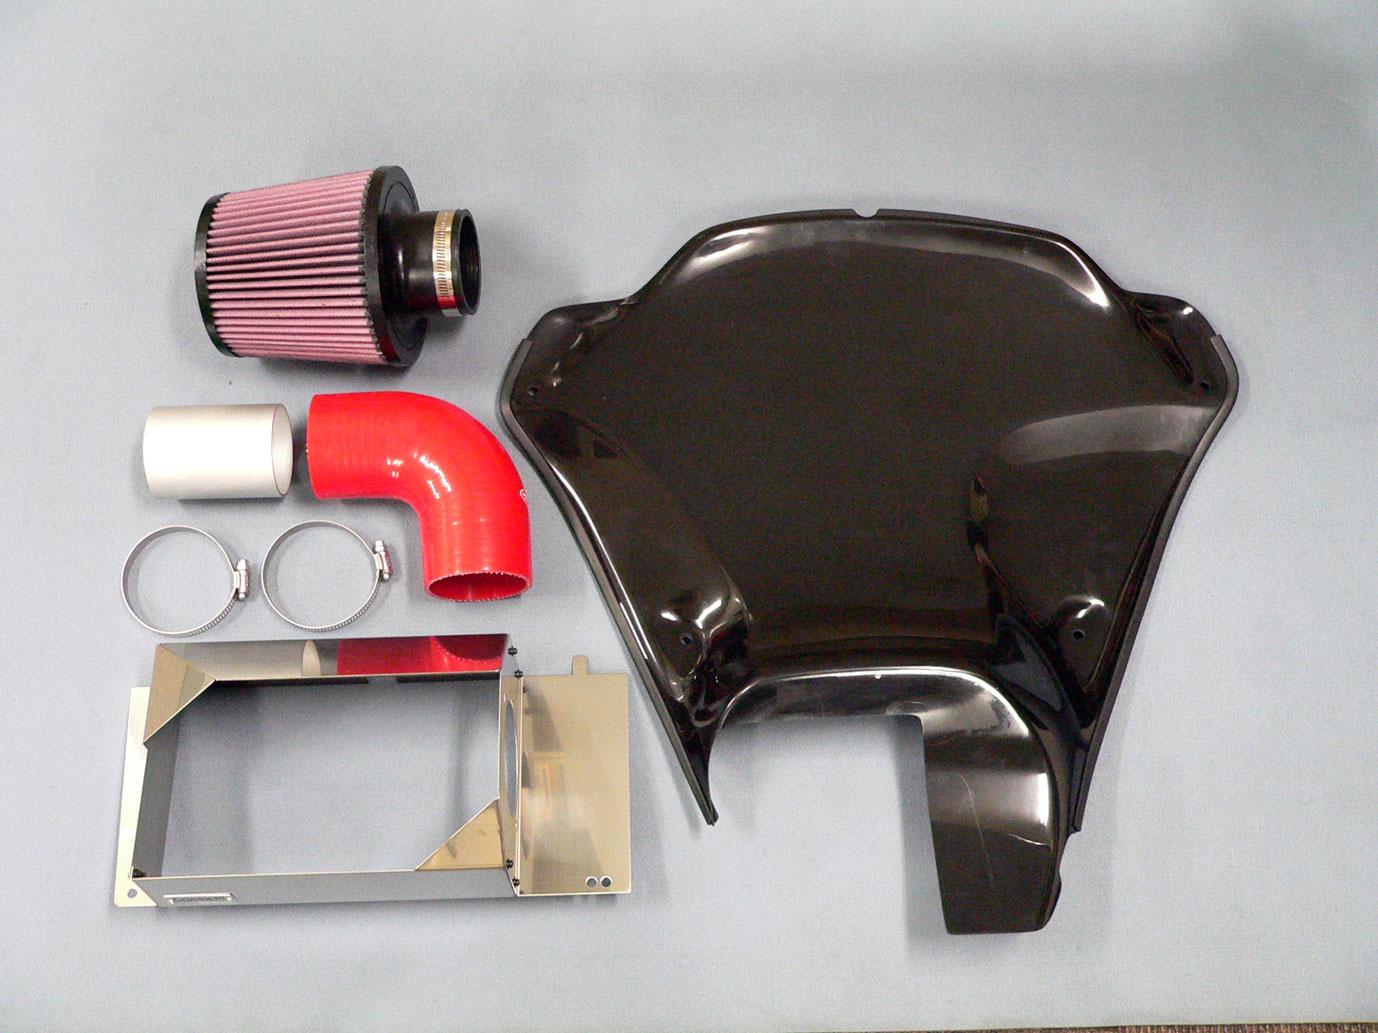 GruppeM(グループエム)インダクションボックス for MINI R55/R56/R57/R58/R59 COOPER S 及び JCW